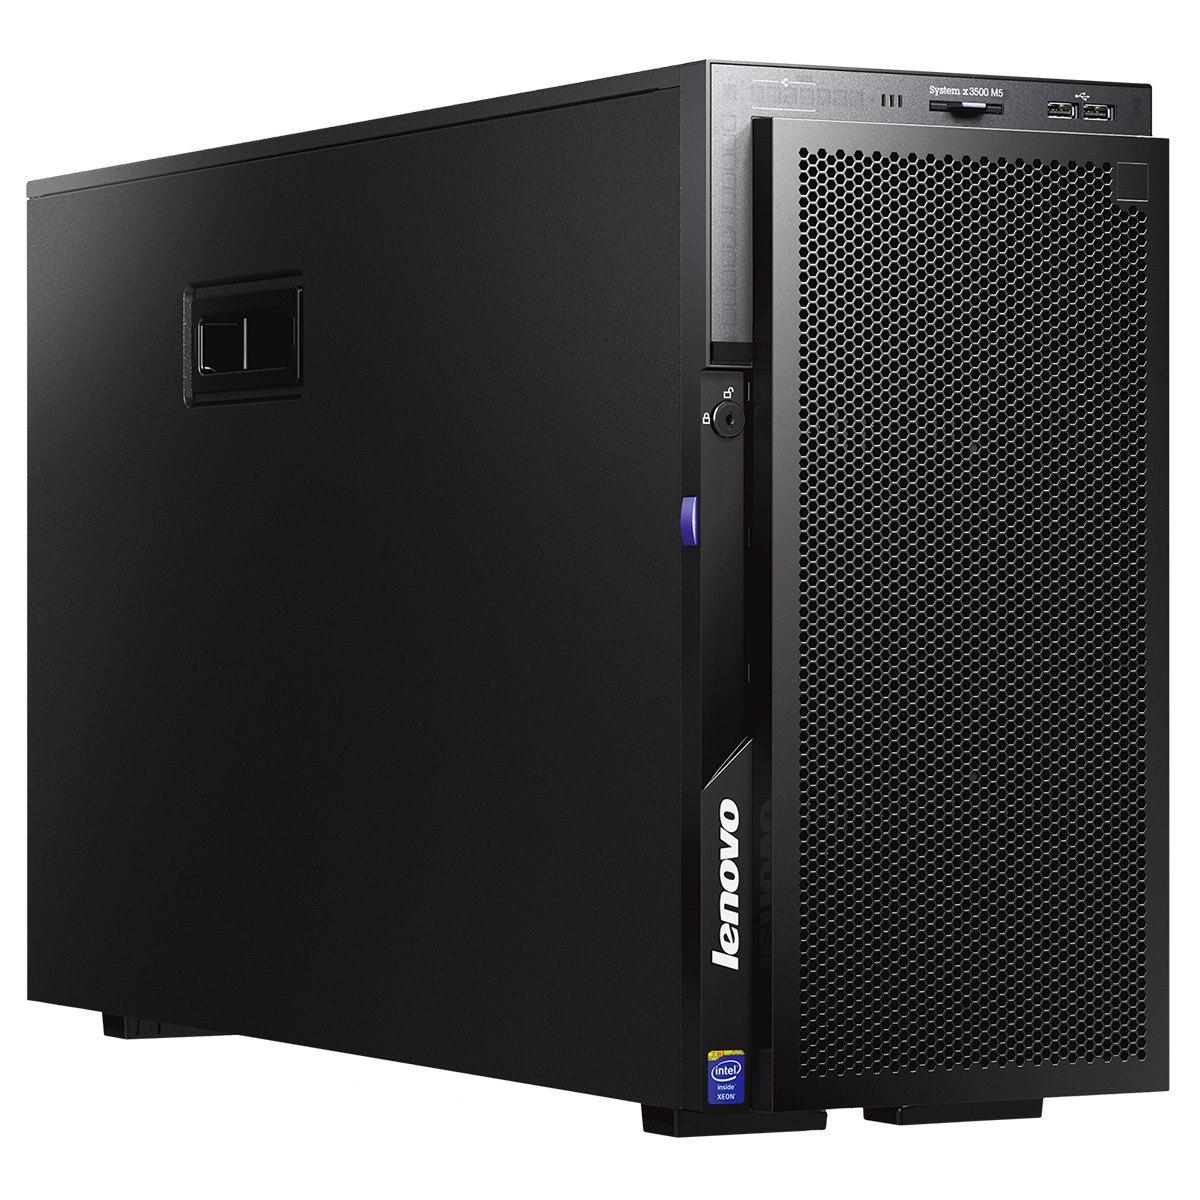 Lenovo System x x3500 M5 5464B2M 5U Tower Server - 1 x Intel Xeon E5-2609 v3 Hexa-core (6 Core) 1.90 GHz - 8 GB Installed DDR4 SDRAM - 12Gb/s SAS, Serial ATA/600 Controller - 0, 1, 10 RAID Levels - 1 x 550 W